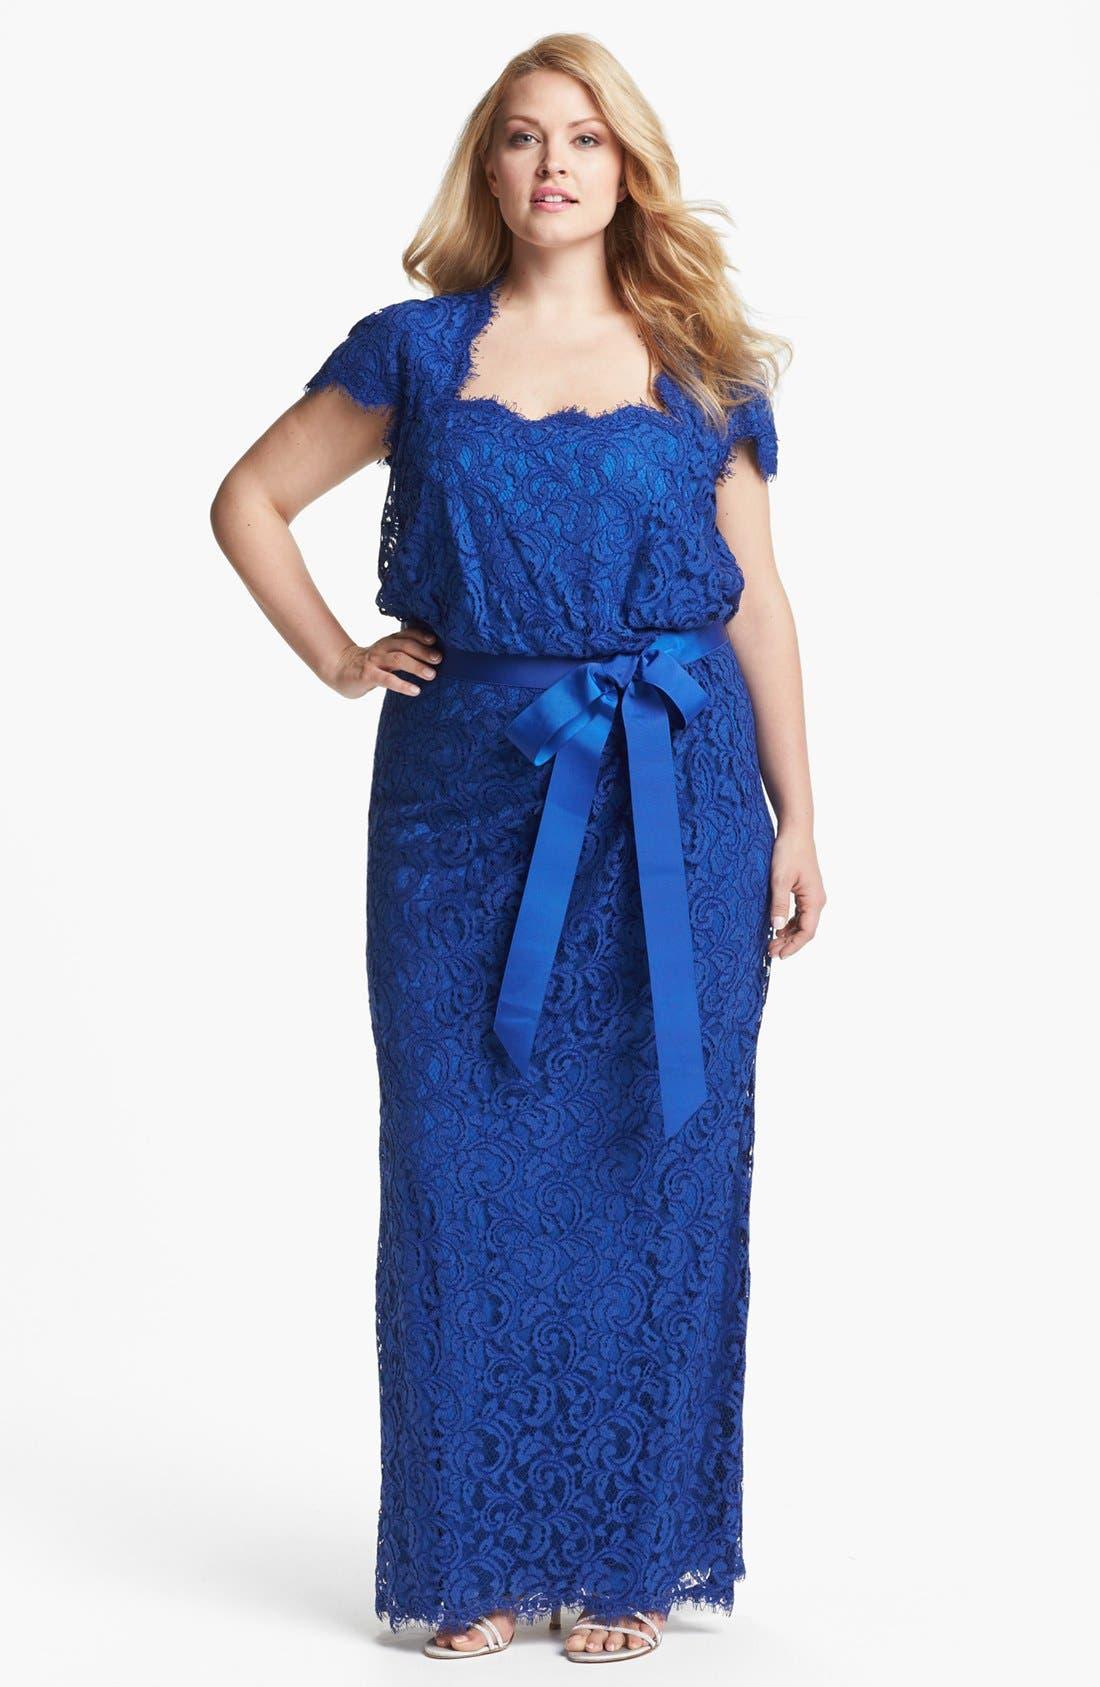 Alternate Image 1 Selected - Tadashi Shoji Grosgrain Trim Lace Gown (Plus Size)